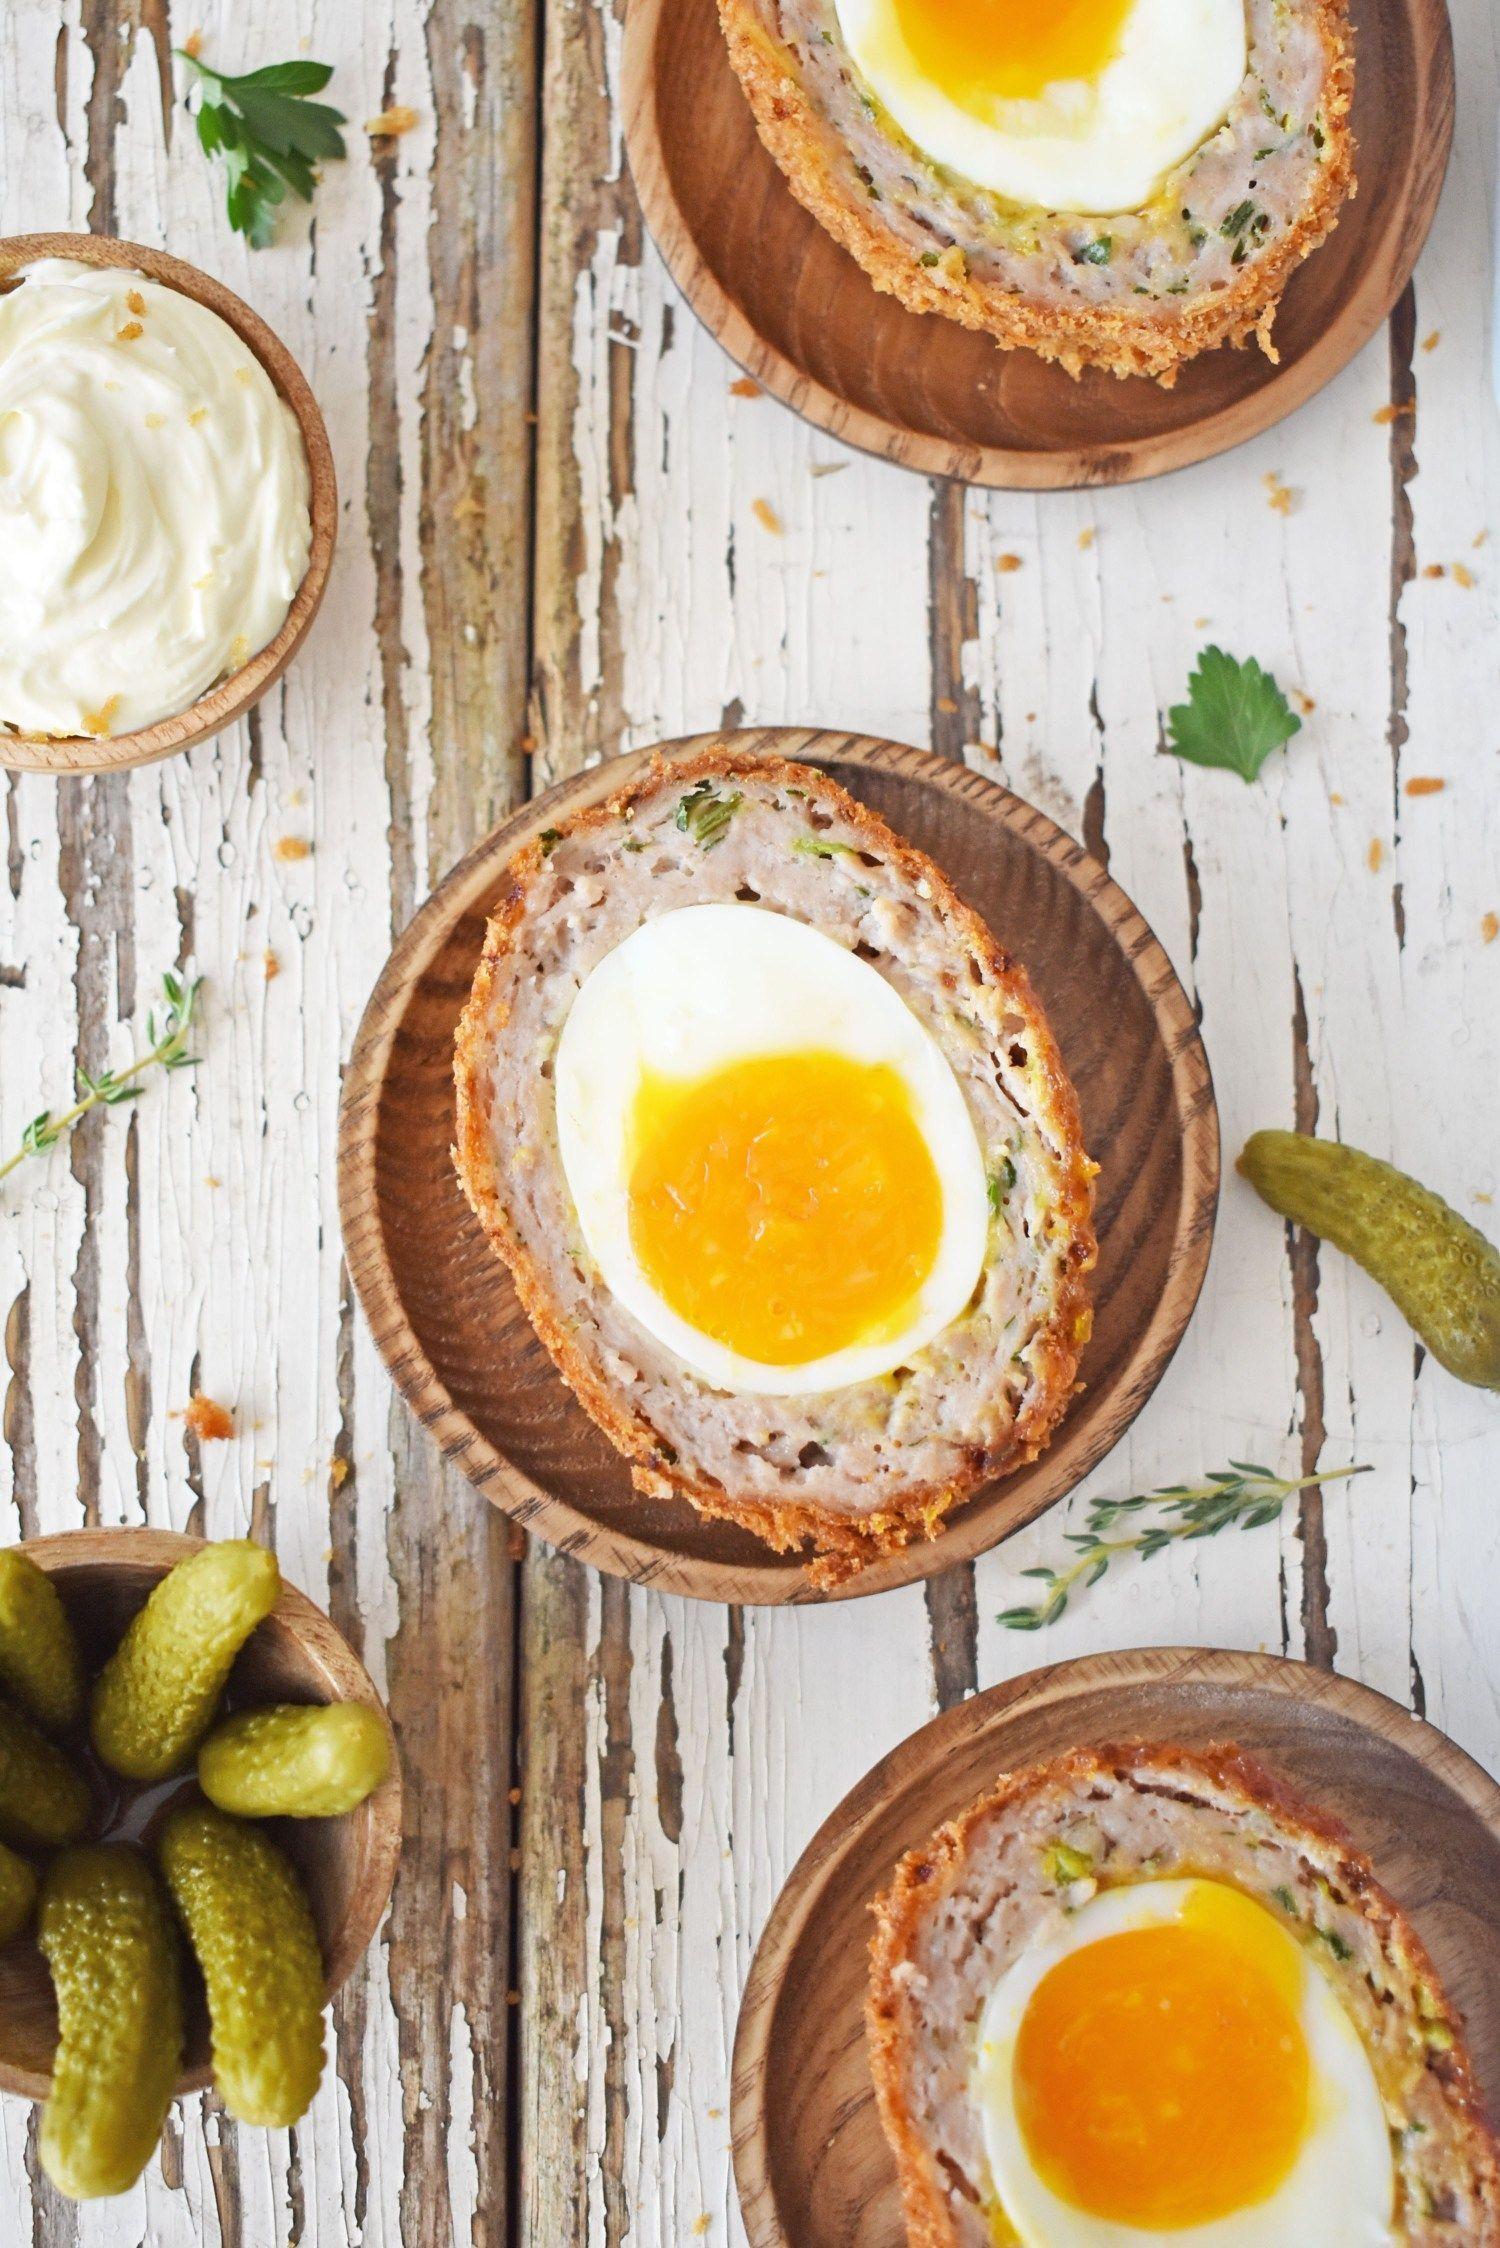 Crispy Scotch Egg with Runny Yolk #scotcheggs Crispy Scotch Eggs with Runny Yolk – Scruff & Steph #scotcheggs